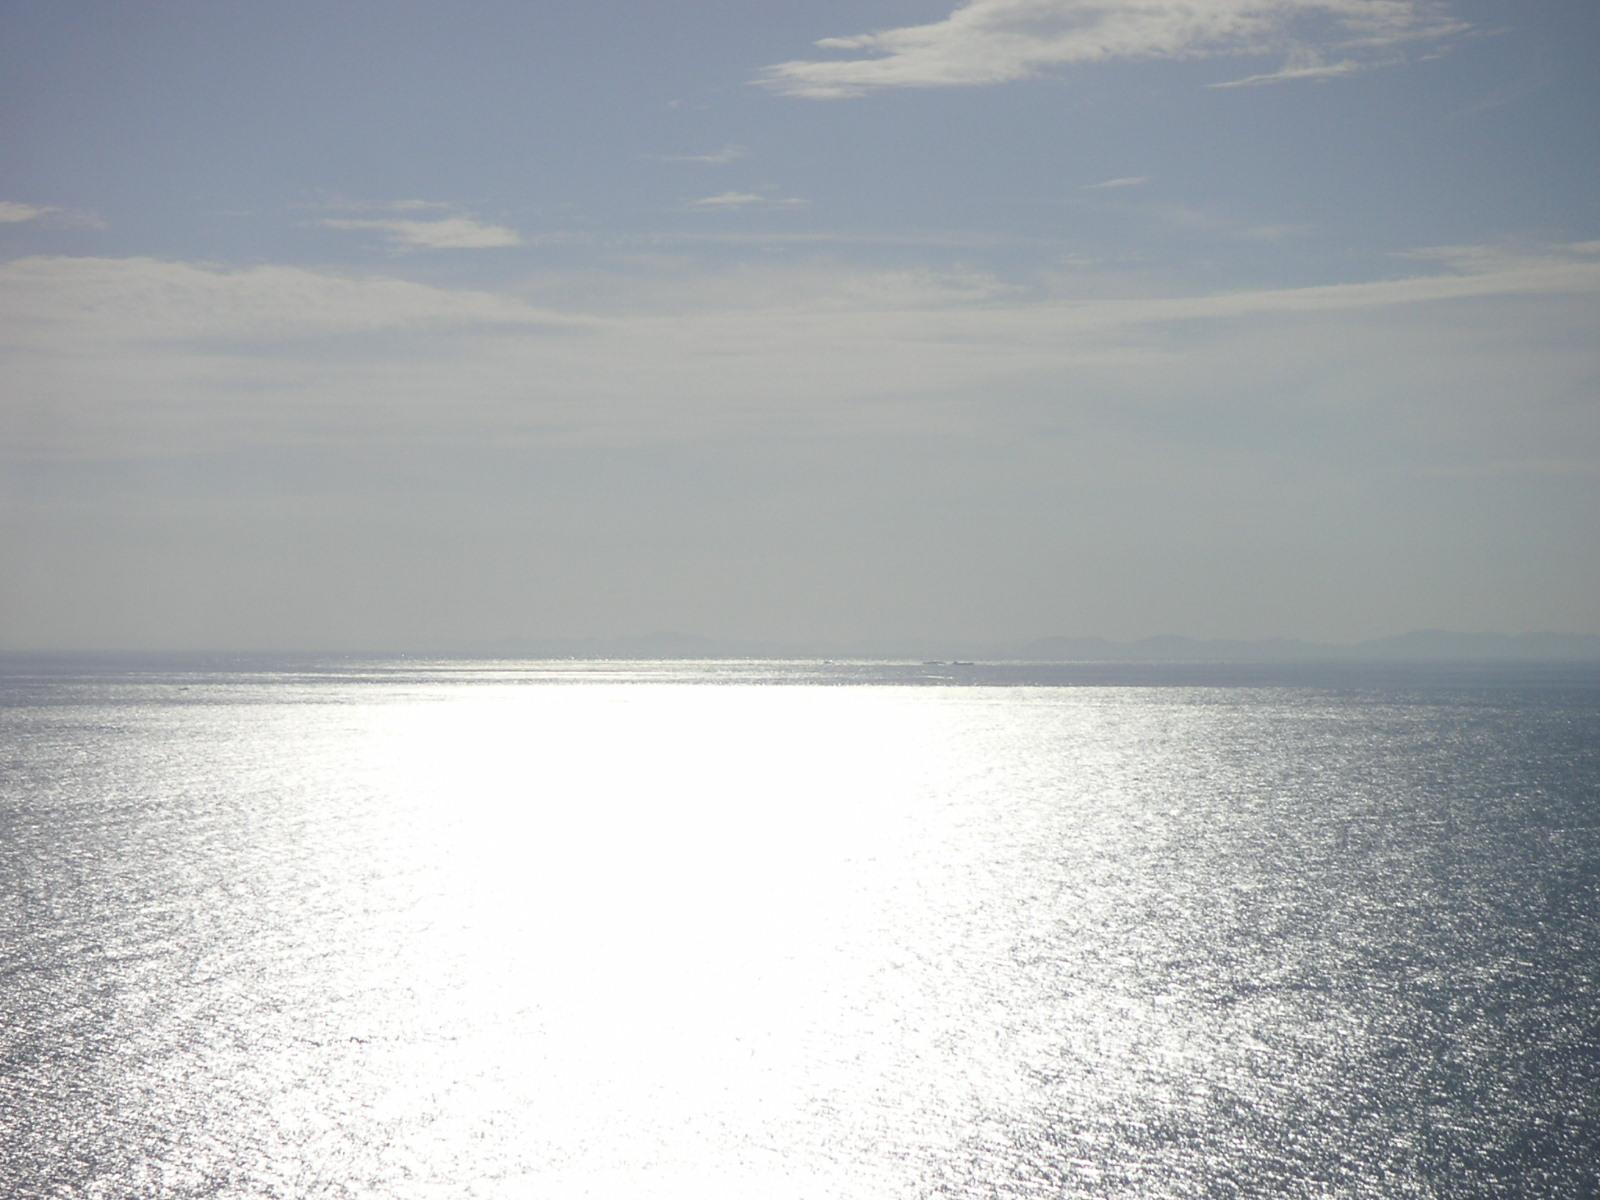 Silent~Sea・peace_f0146802_14859.jpg